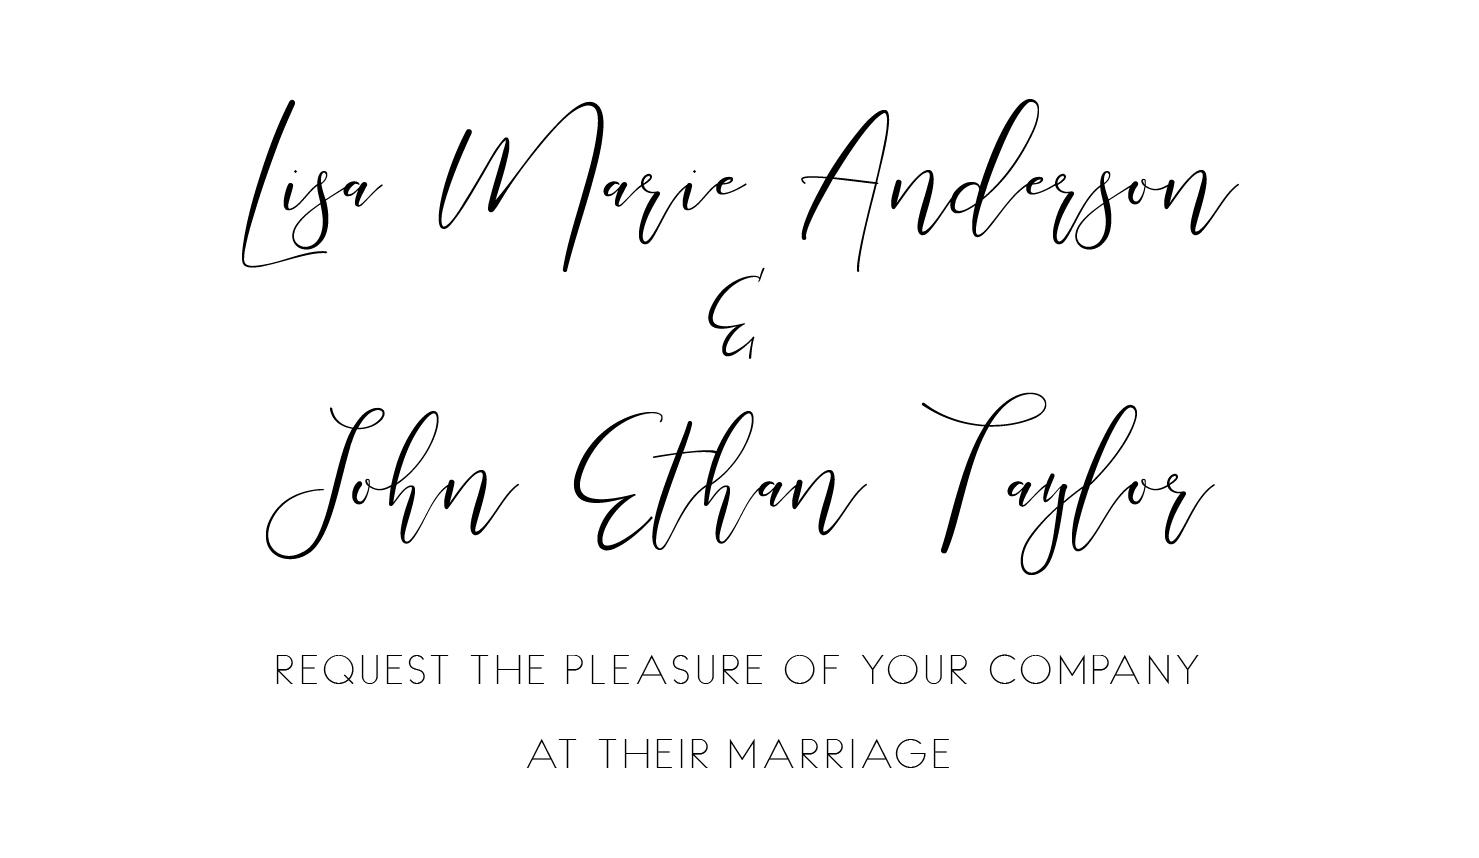 Best Wedding Invitation Fonts – Find Your Best Match